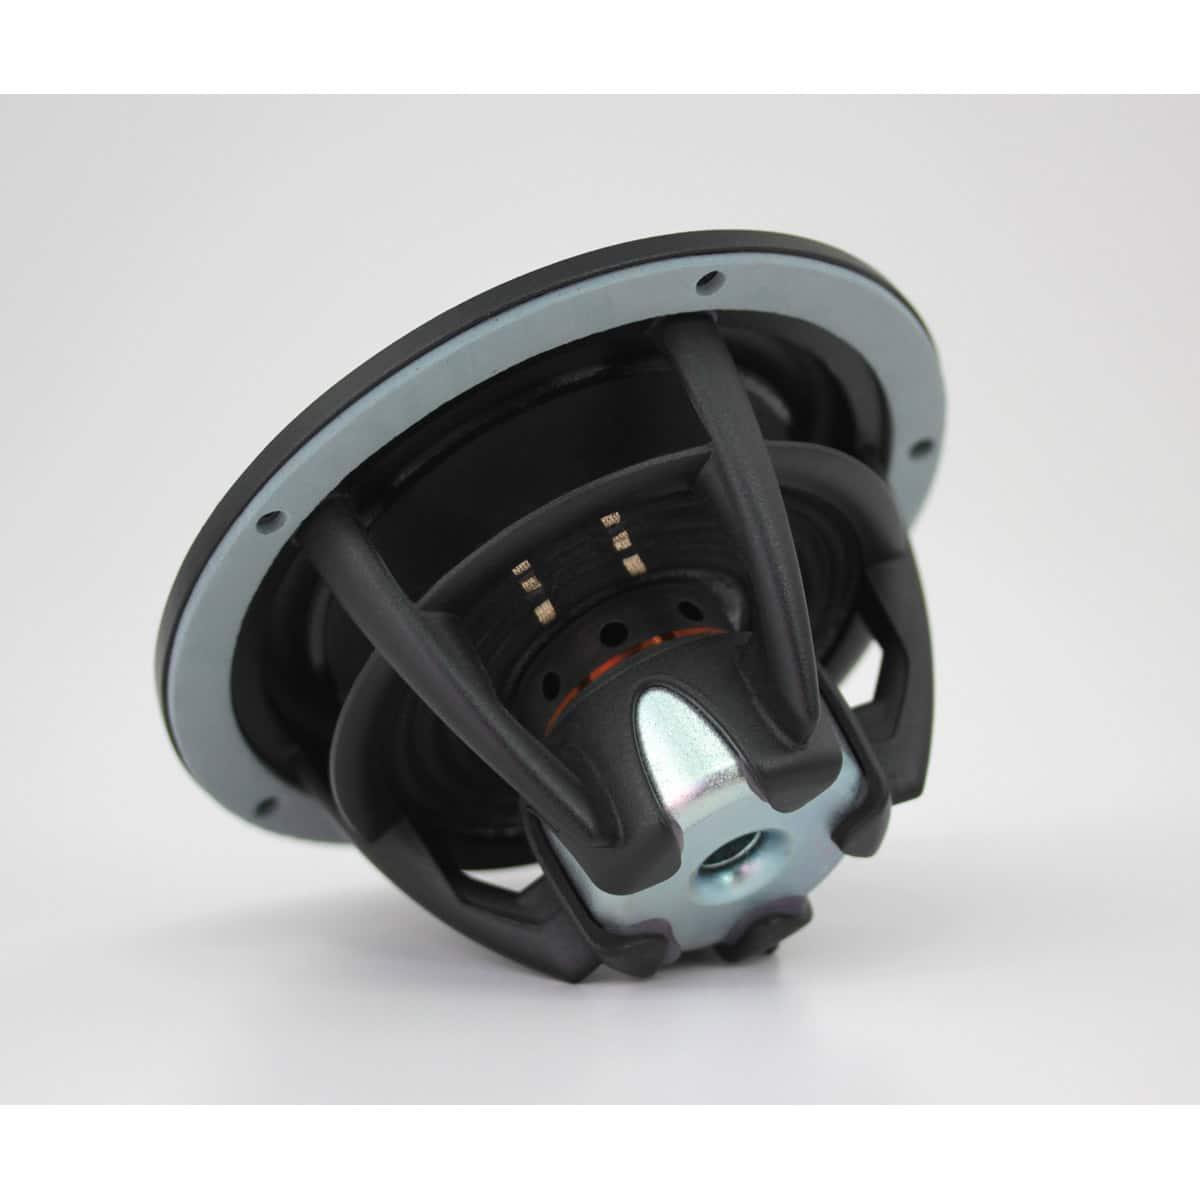 Barefoot Sound MicroMain 27 Gen2 Pro Audio, Audio Monitors, Studio Monitor Barefoot Sound Micromain 27 Gen2 7